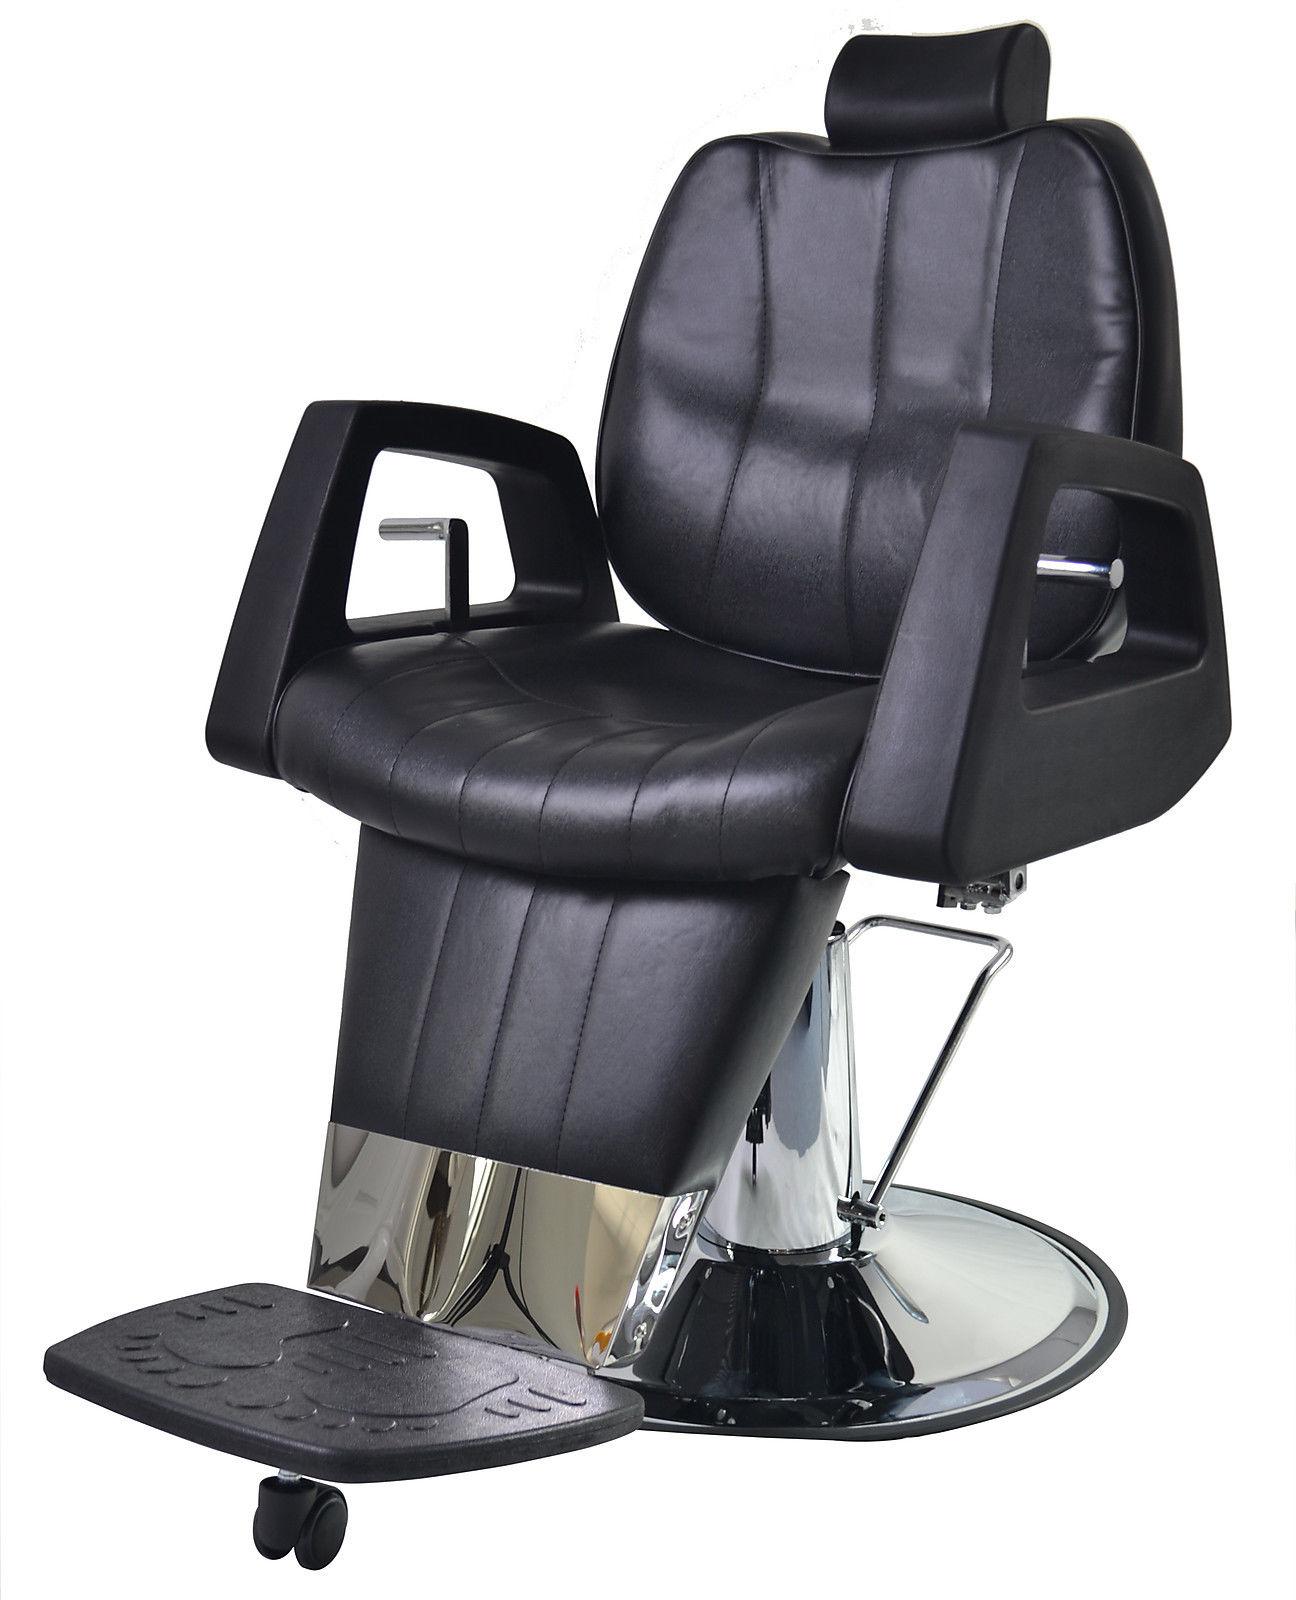 ez chair barber shop green tufted barberpub purpose hydraulic recline salon